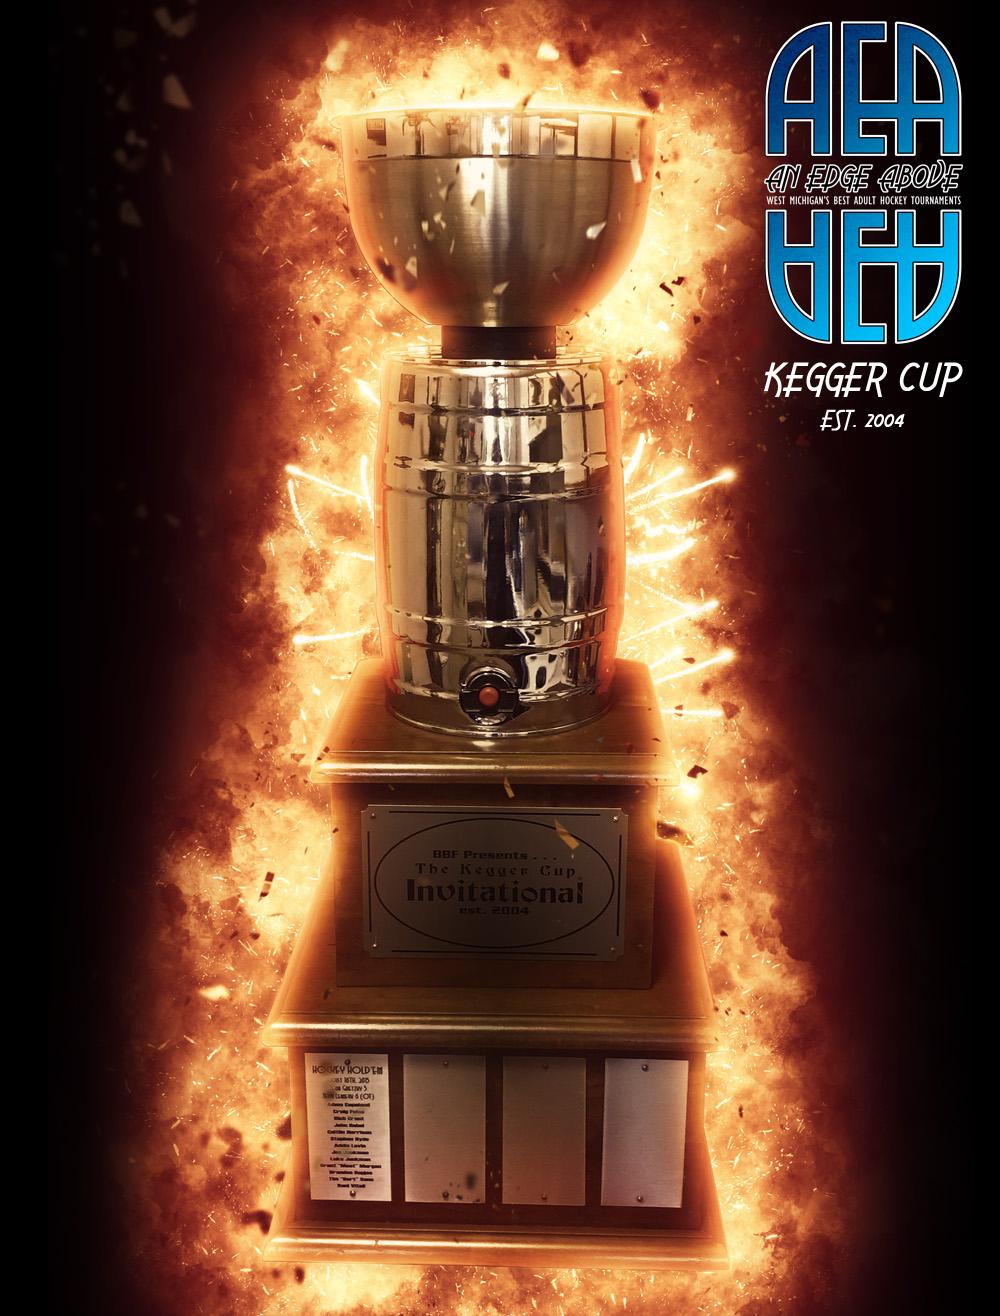 [template_images/kegger_cup.jpg]